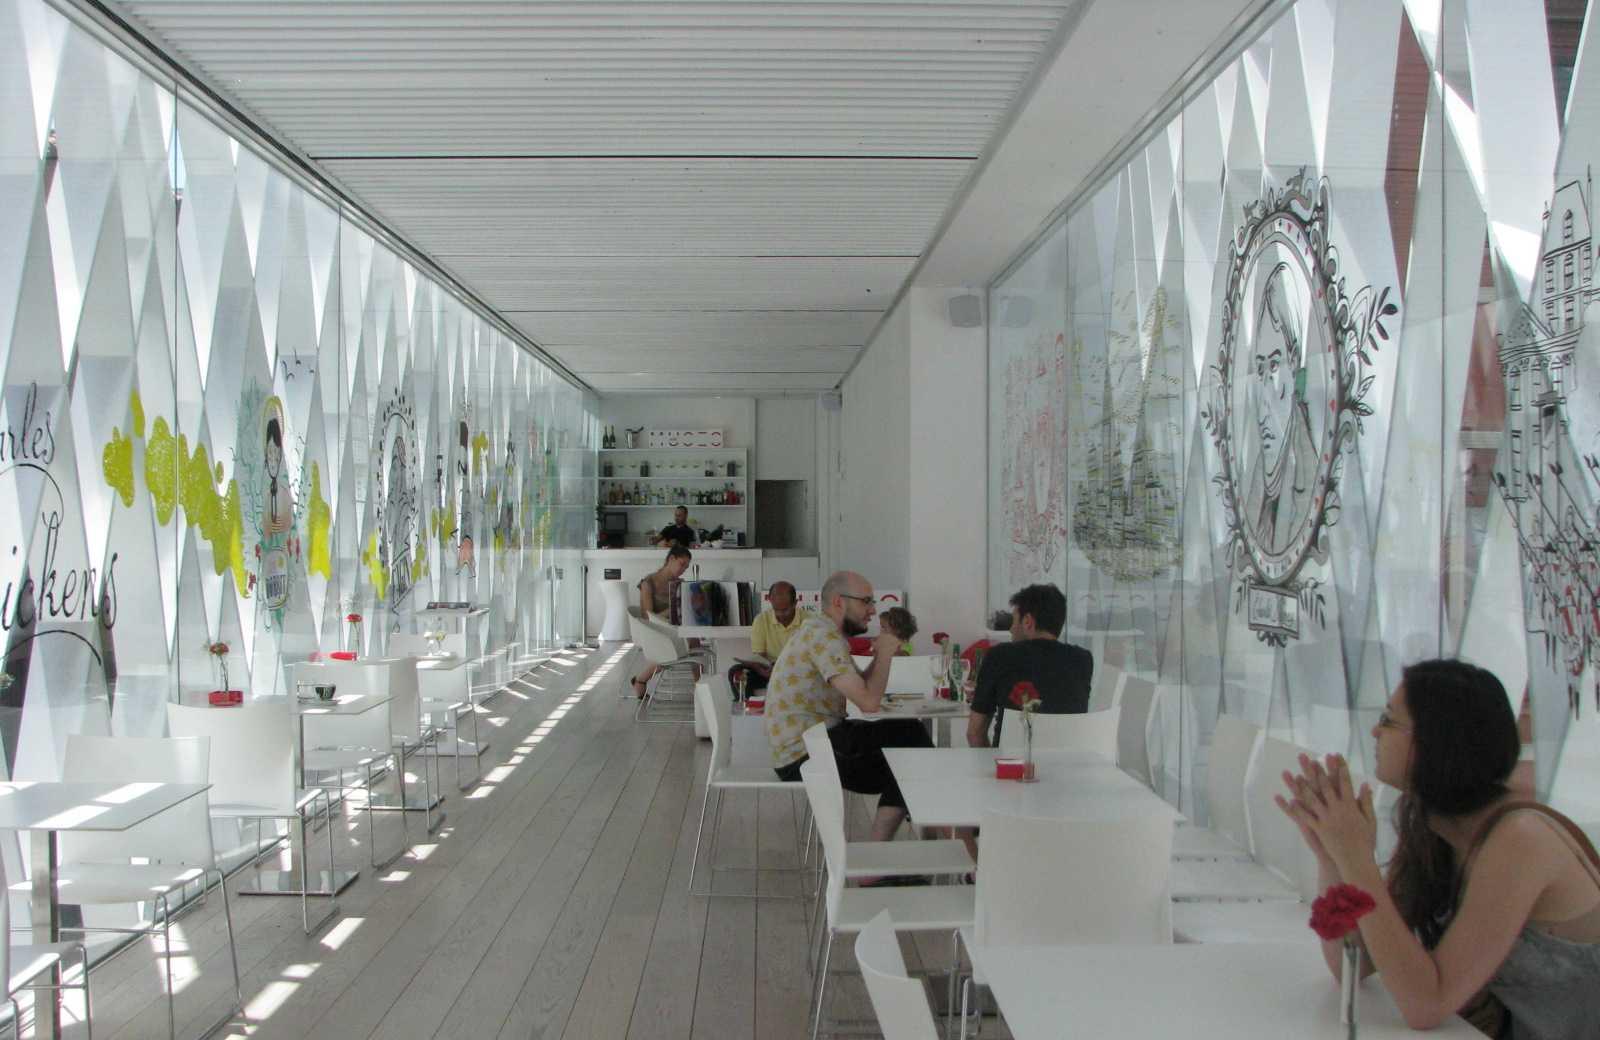 Arquinotas abc madrid museo de aranguren y arquitectos gallegos - Trabajo arquitecto madrid ...